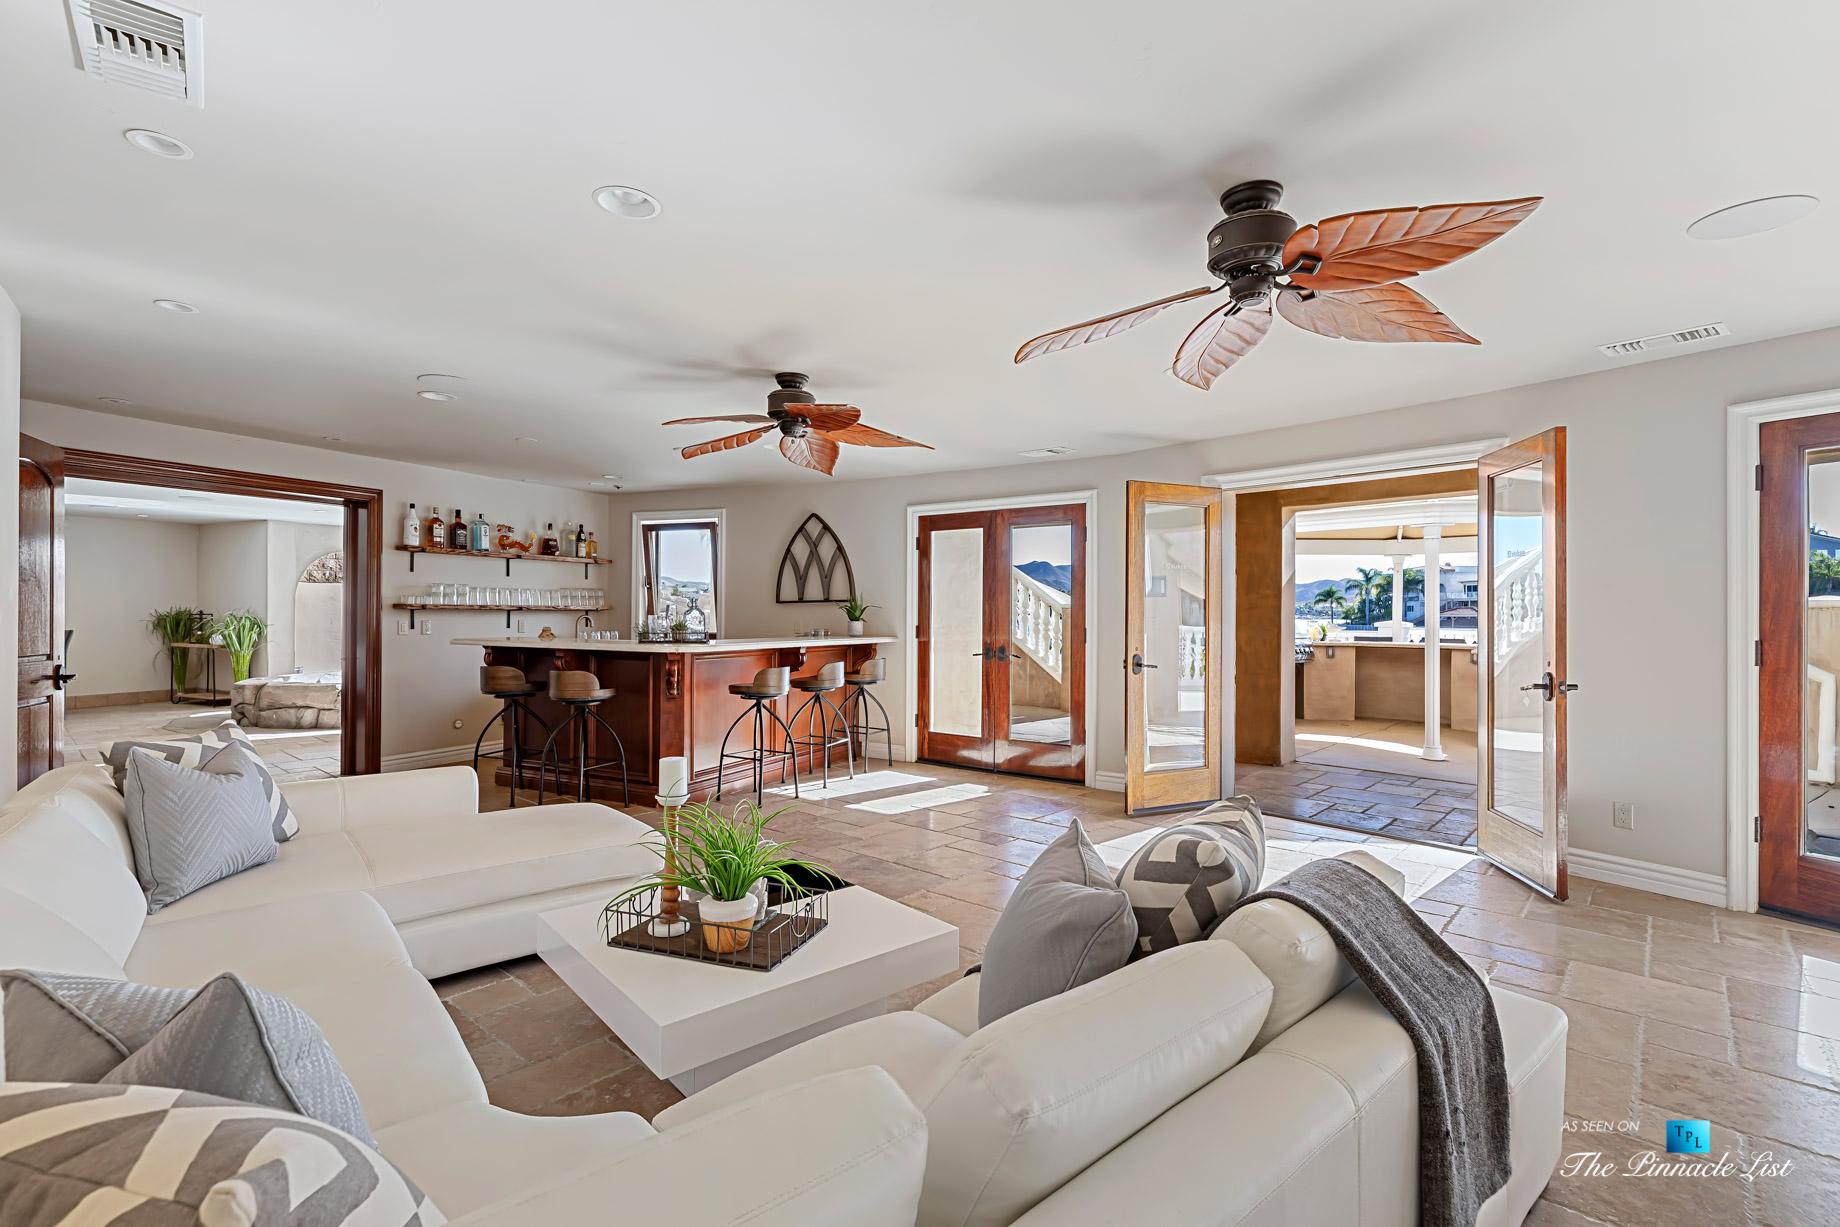 22485 Whirlaway Ct, Canyon Lake, CA, USA